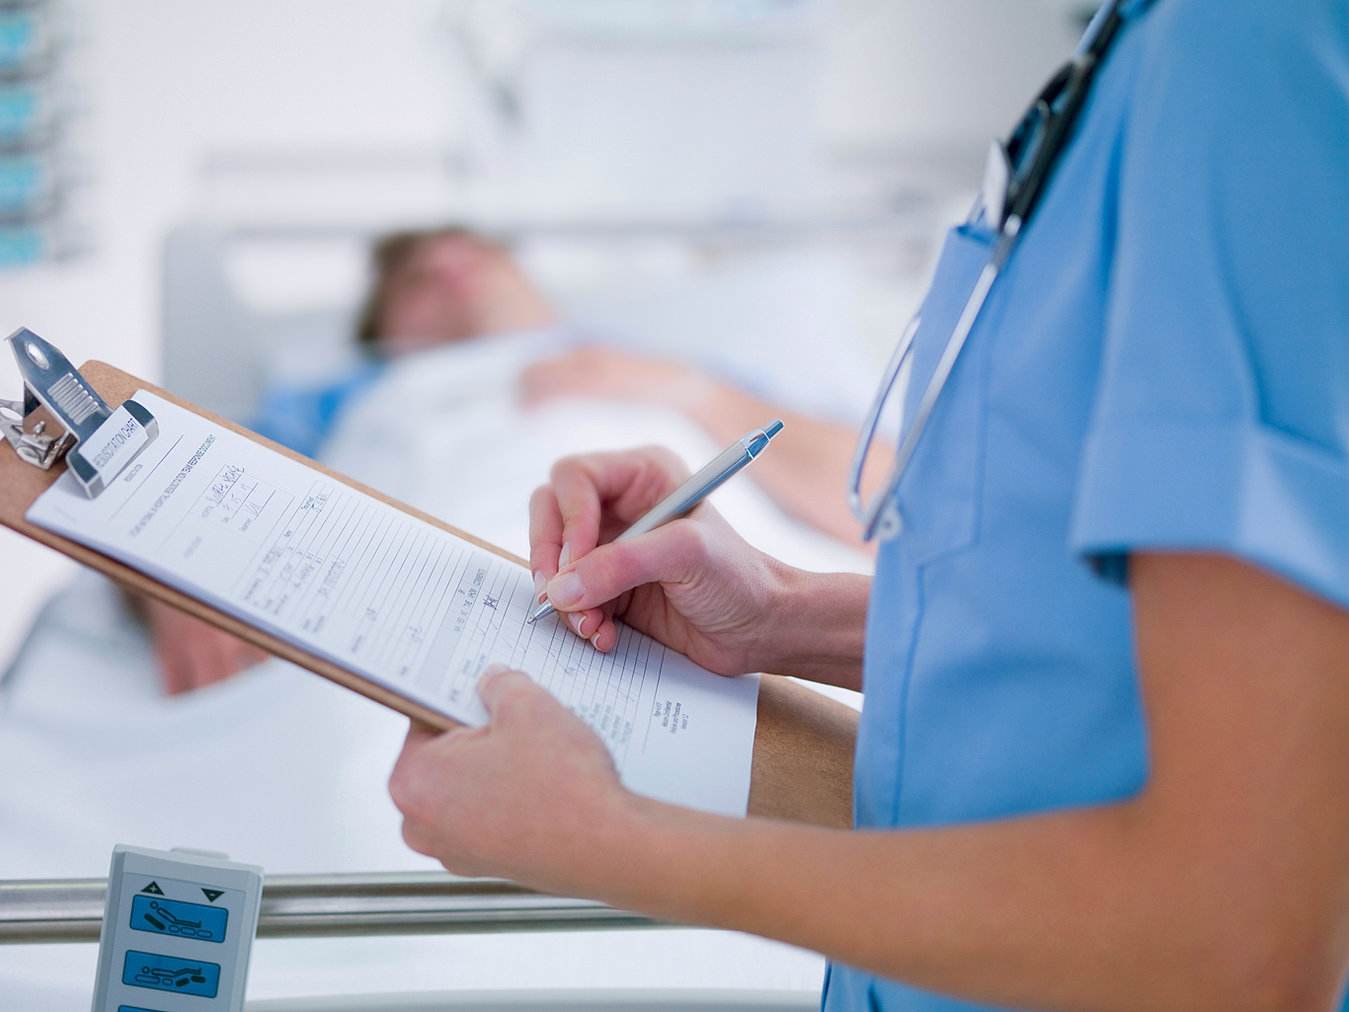 nursing essay writing services brainstorm essays nurse making notes